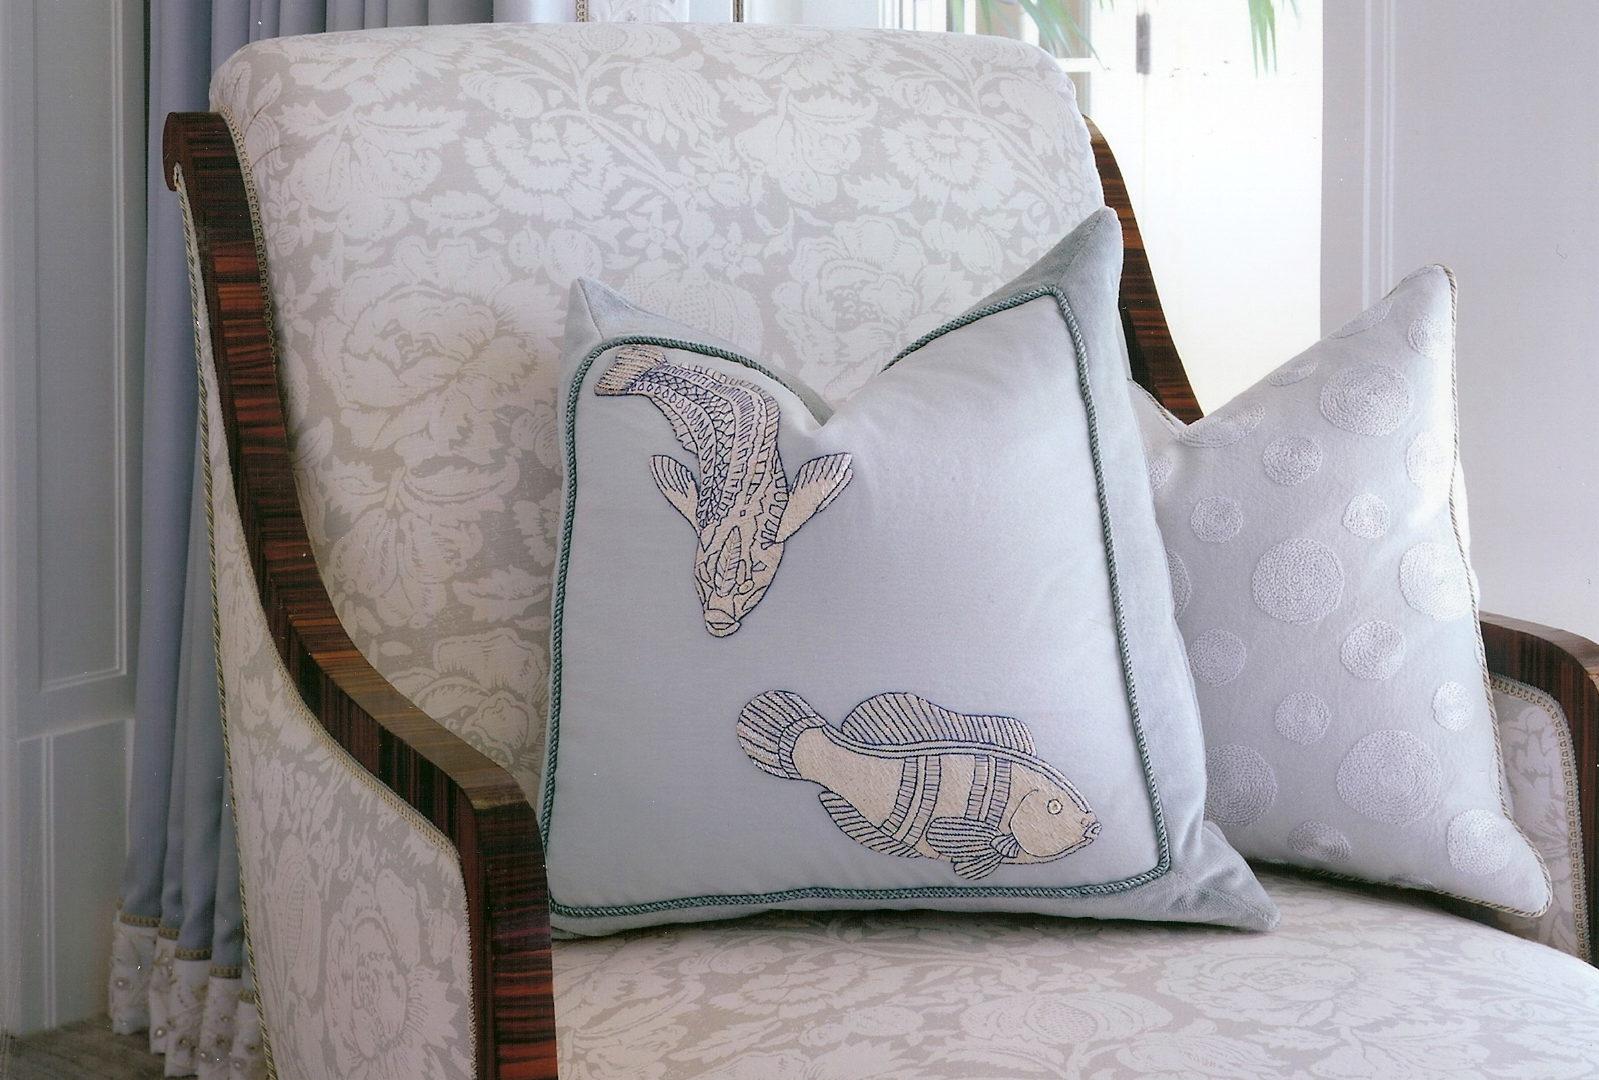 Master Bedroom Fish pillow